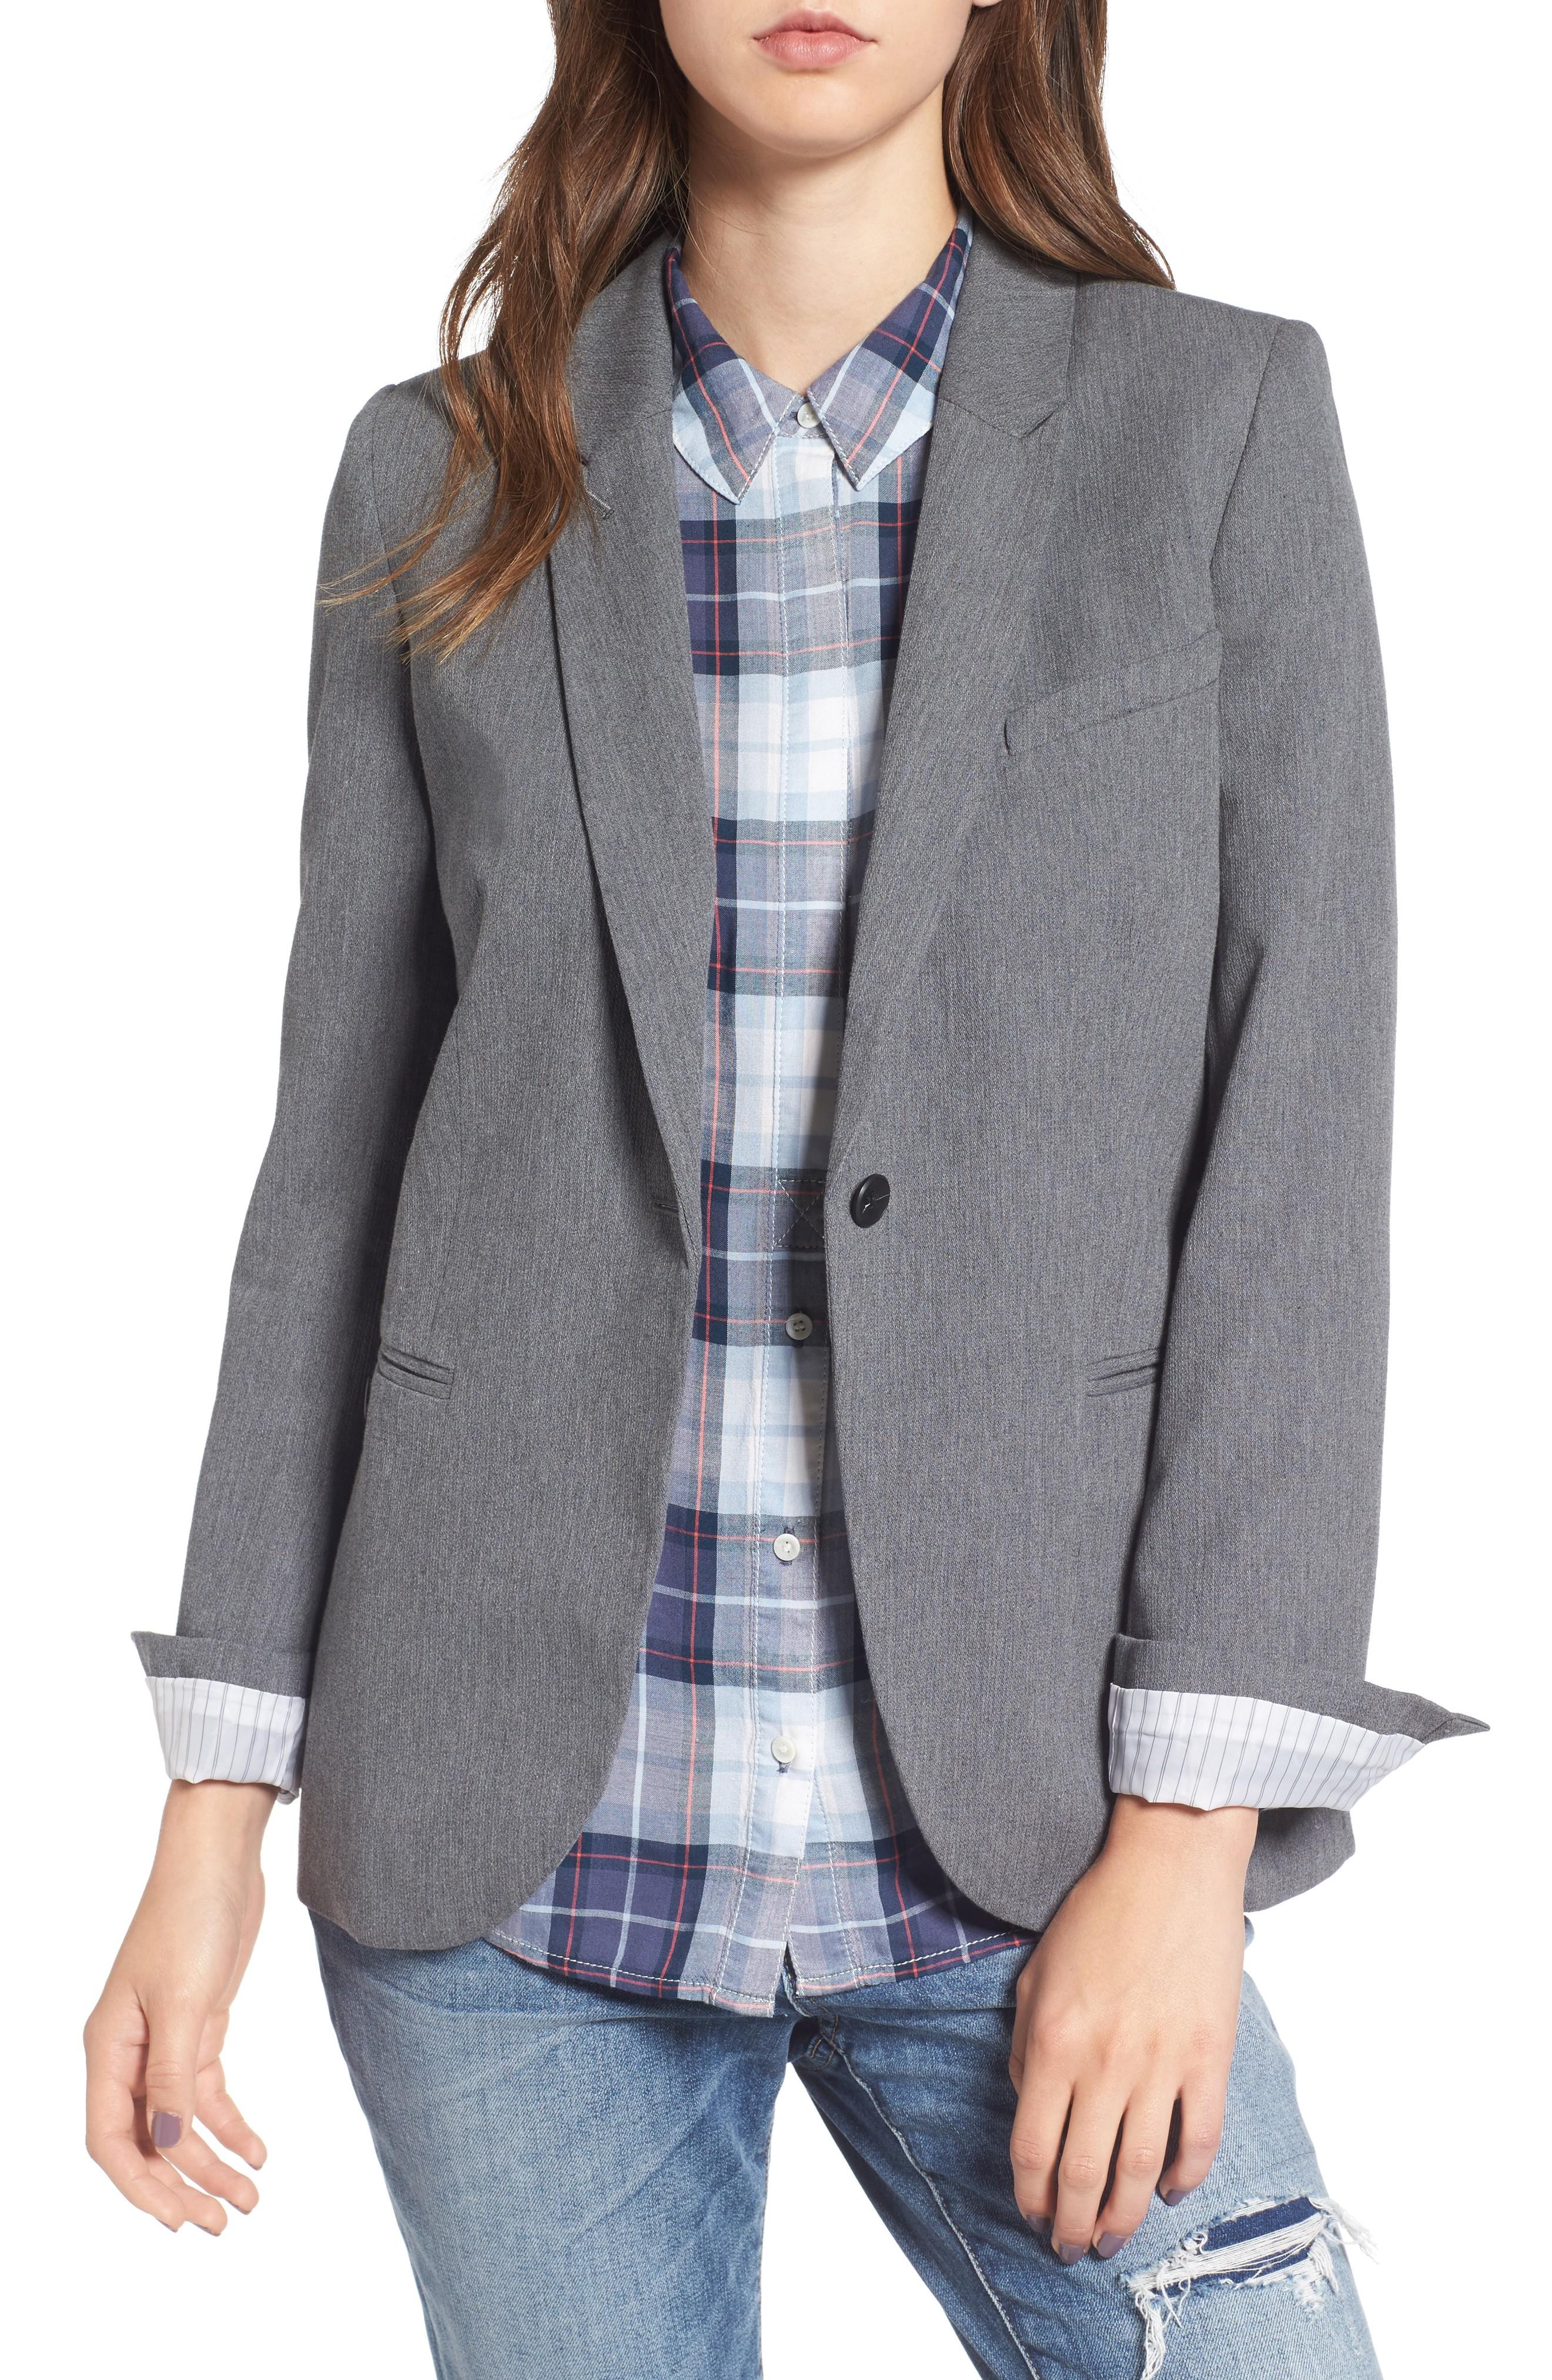 d08ba99cf55 A classic gray blazer. Everyone who doesn t wear black often needs one.  )